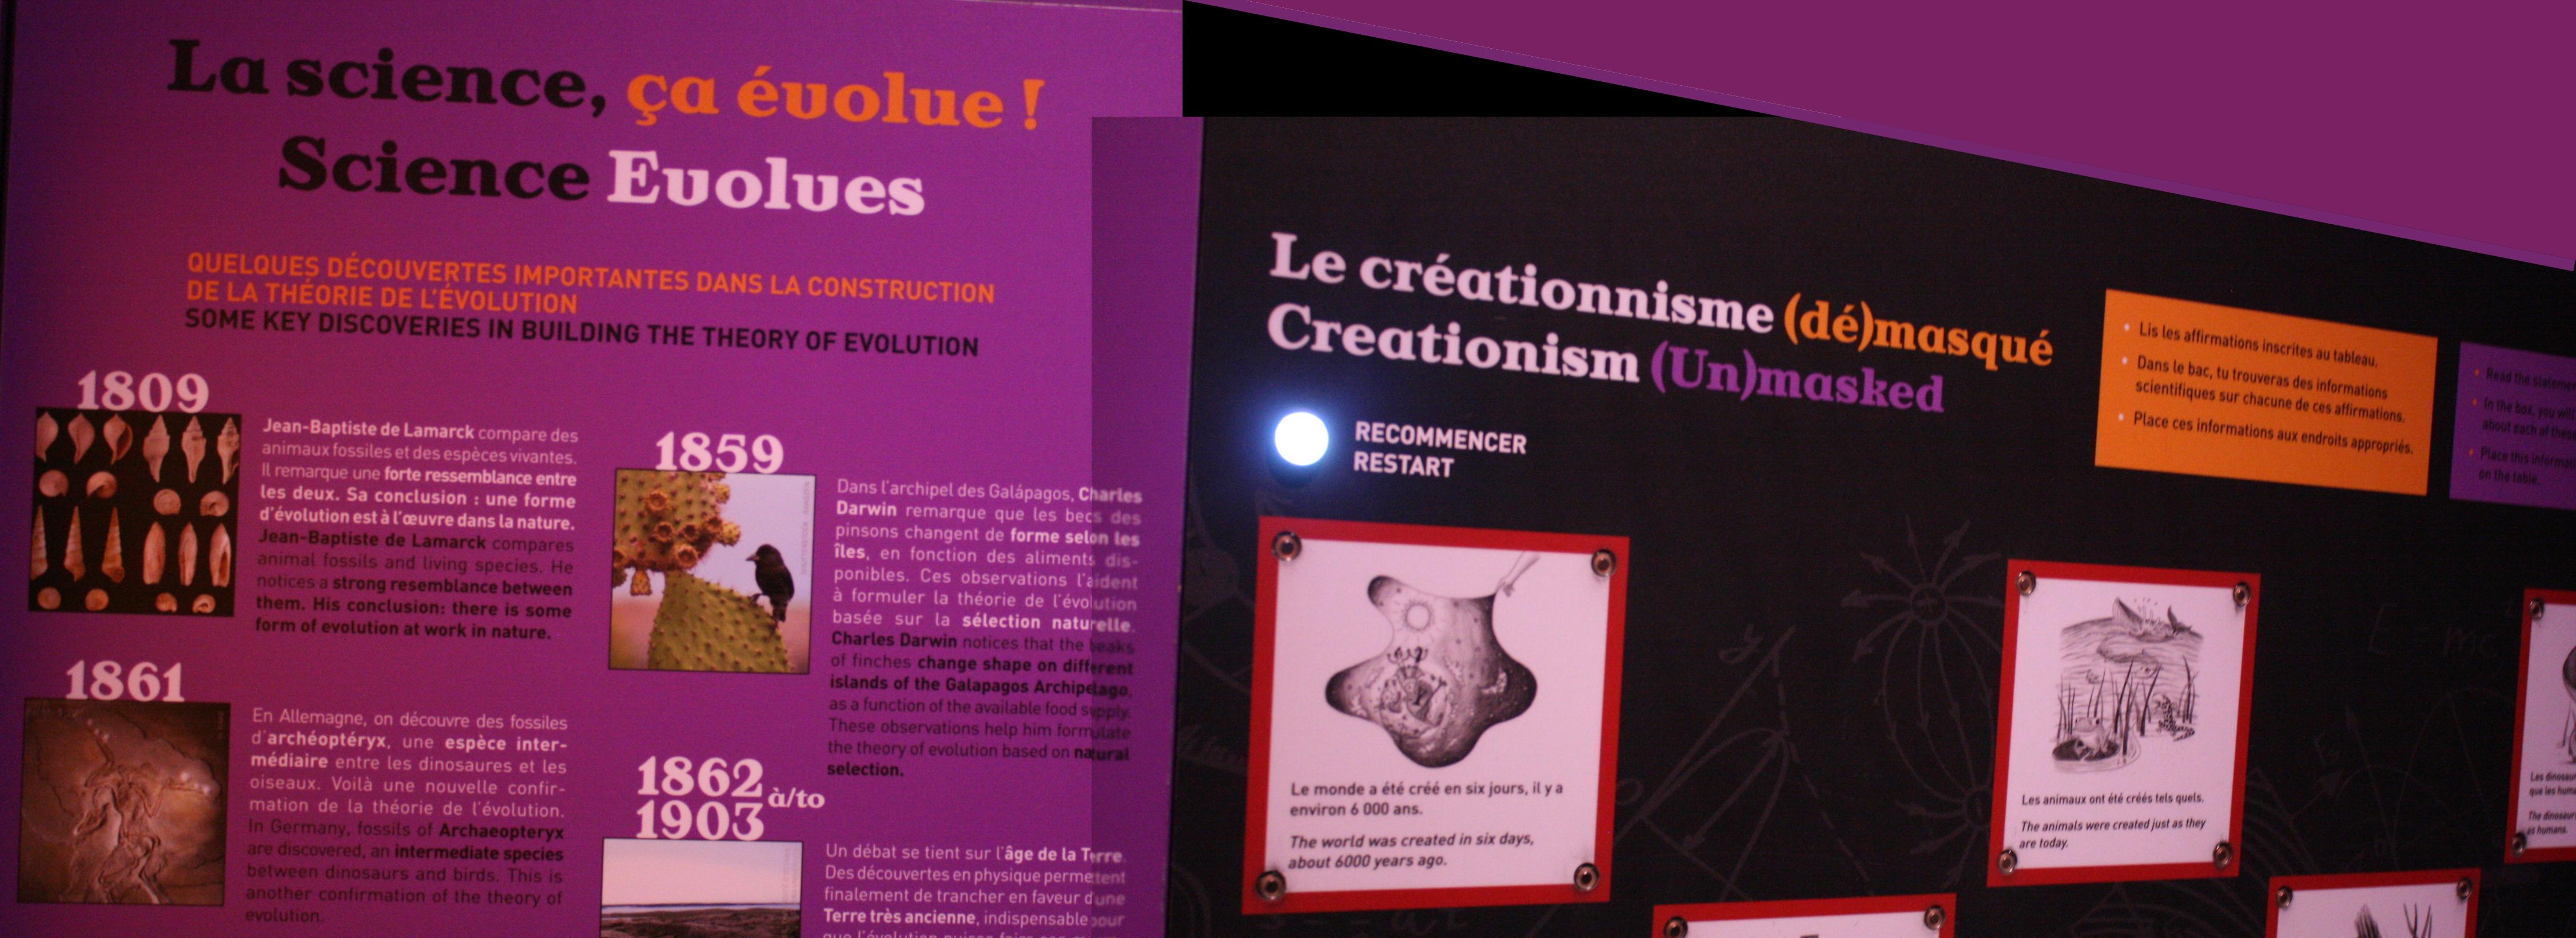 kreationism